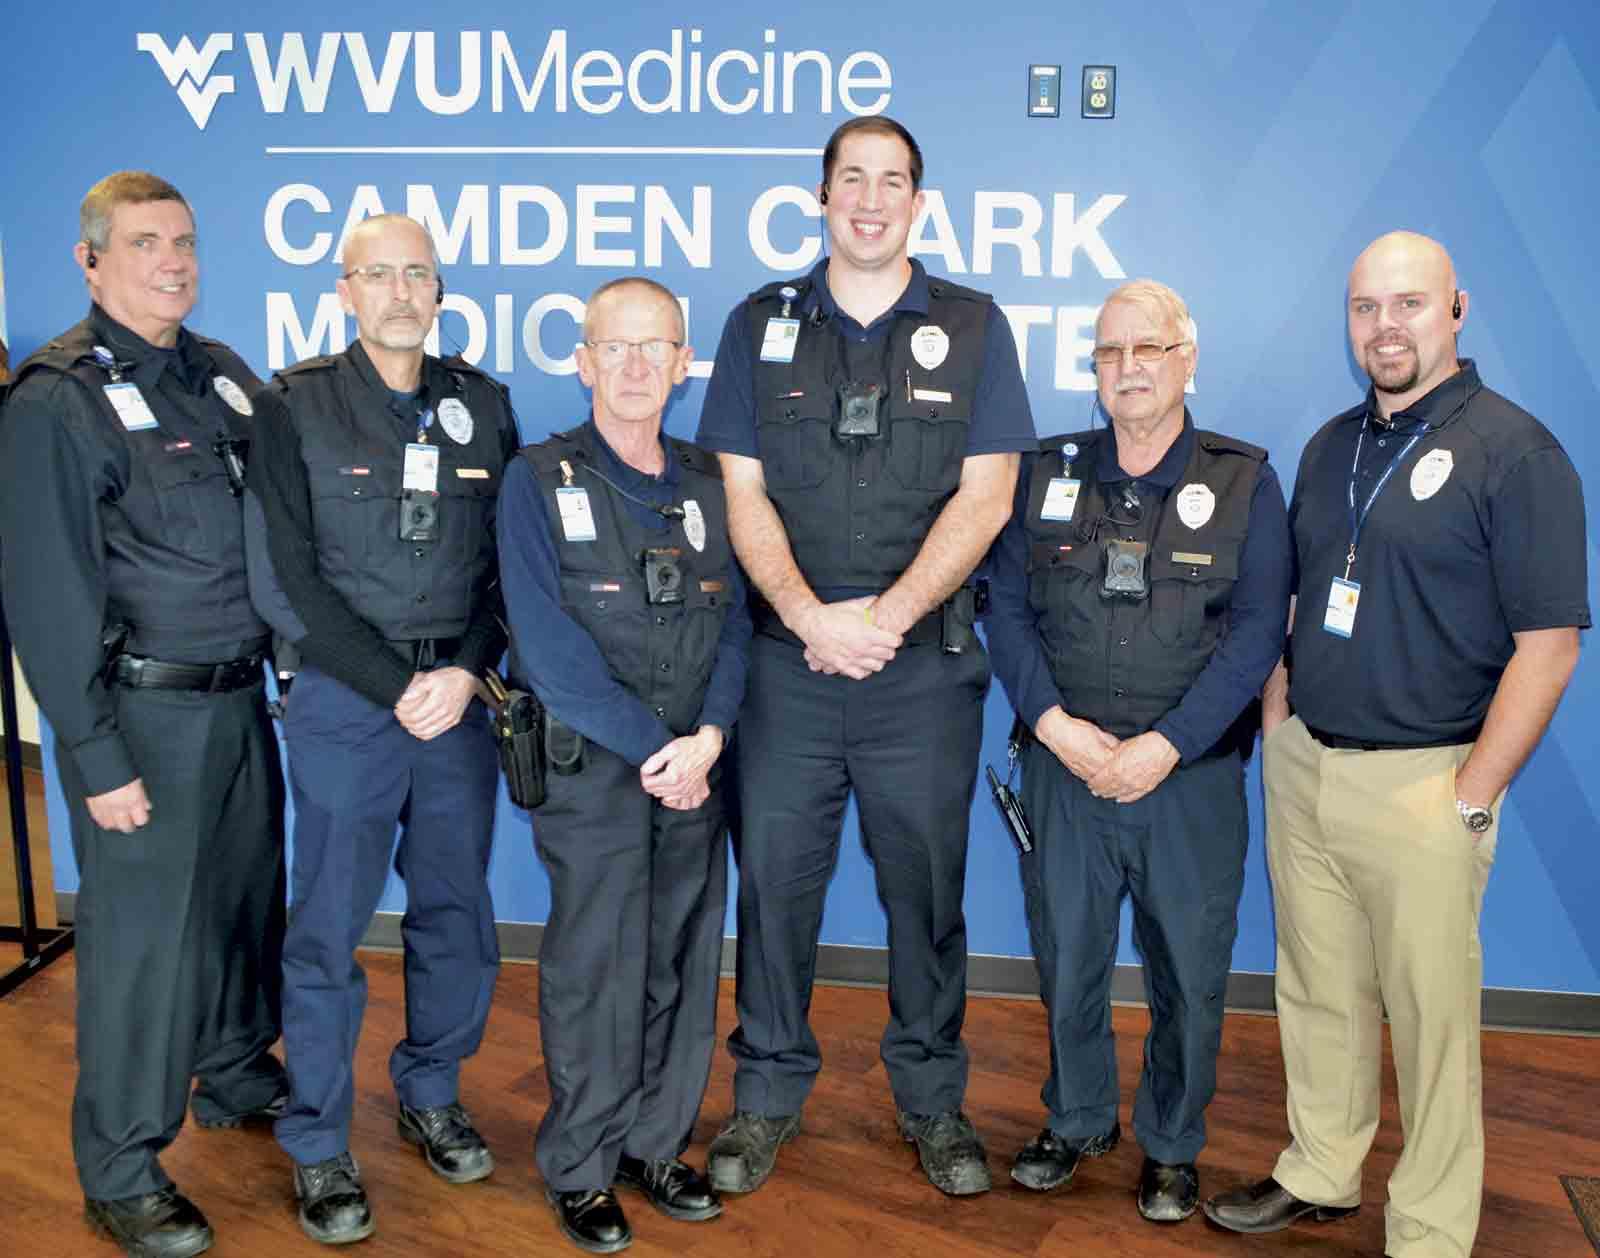 Camden Clark Medical Center providing own security personnel